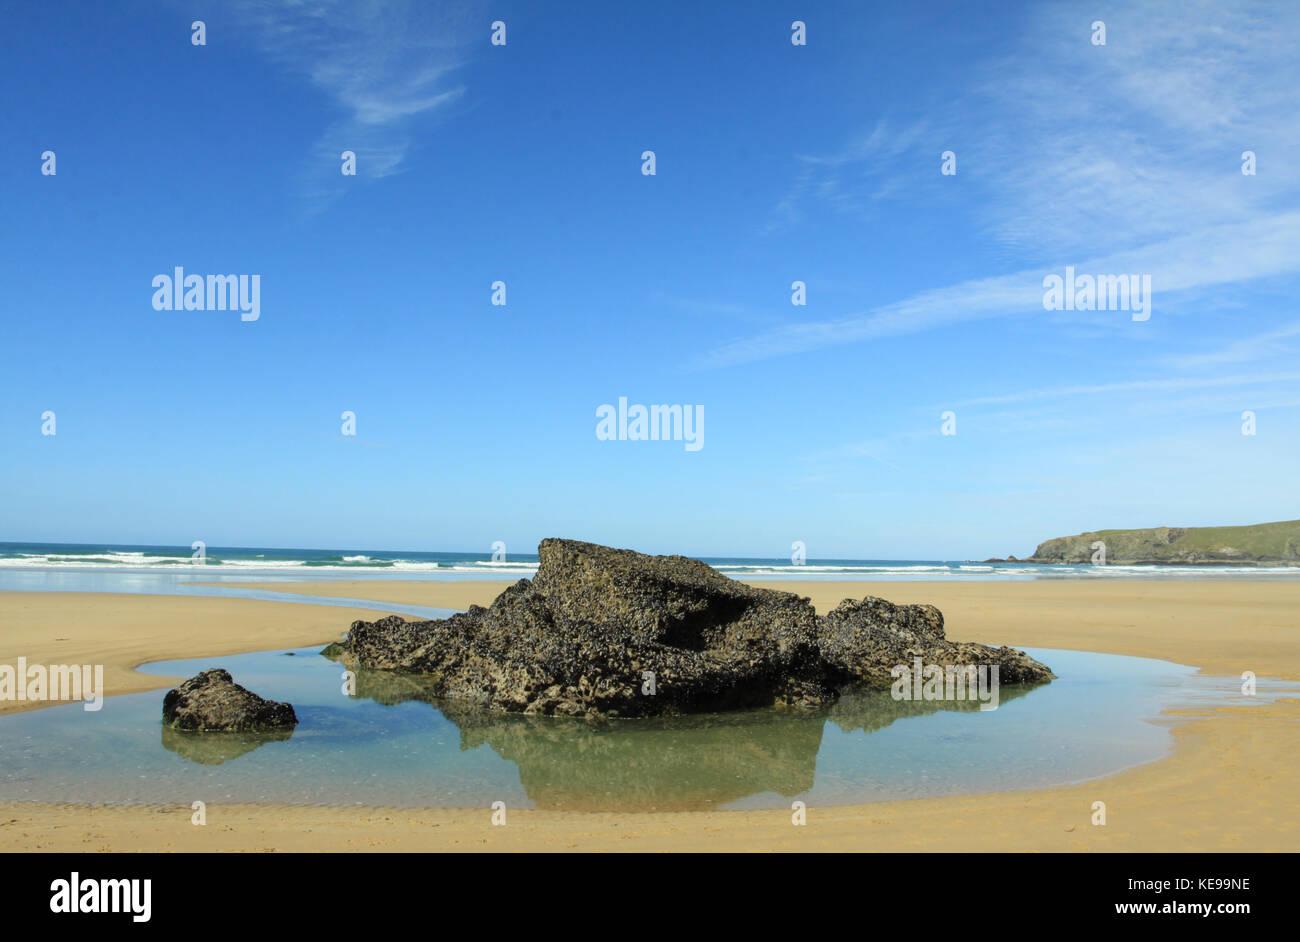 English coastal scene, Bedruthan Steps, Cornwall - Stock Image